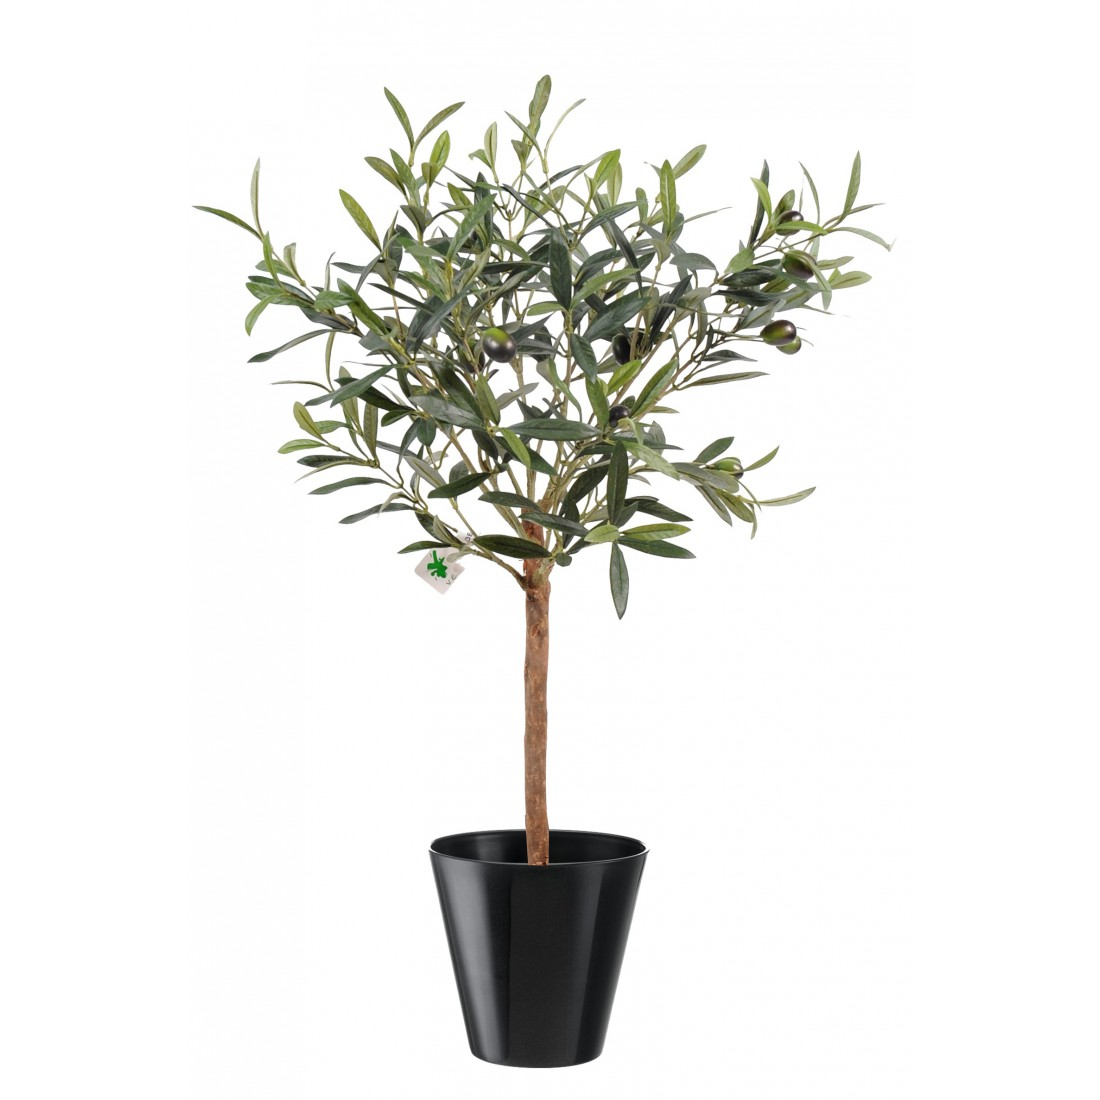 Olivier artificiel plant en pot 35cm arbres mediterraneens oliviers artificiels factice - Arrosage olivier en pot ...